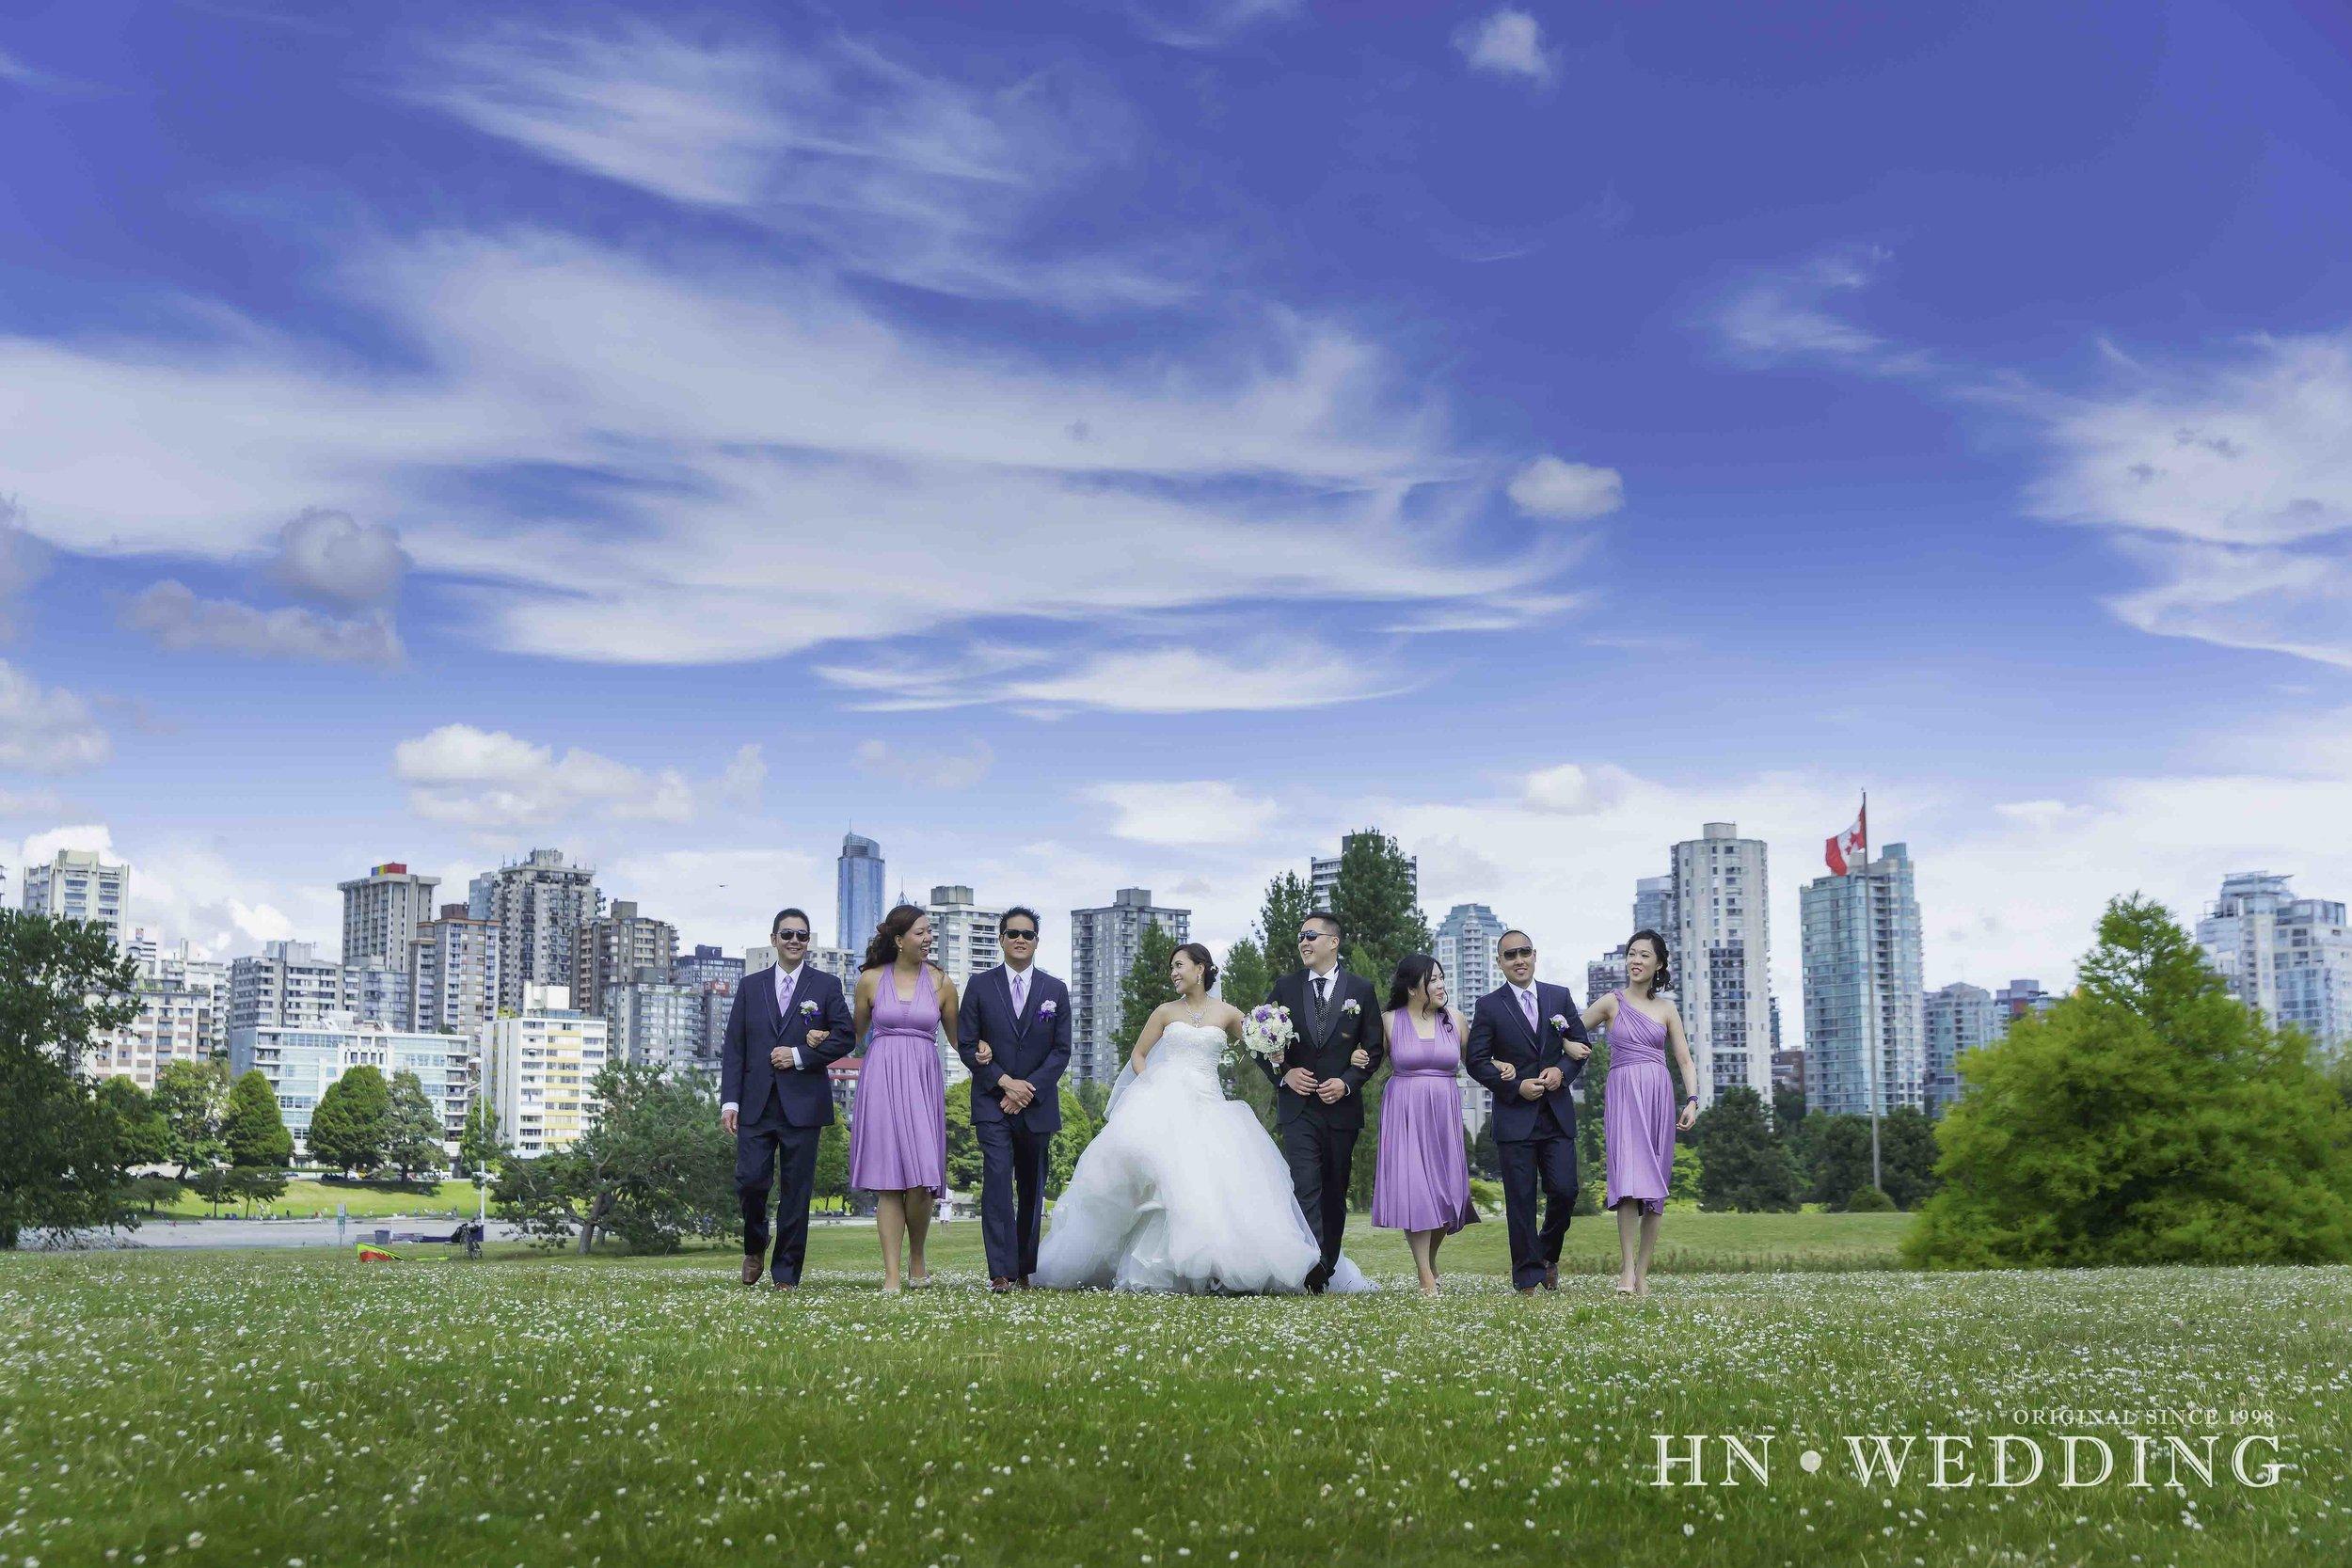 HNwedding-20160822-wedding-6442.jpg